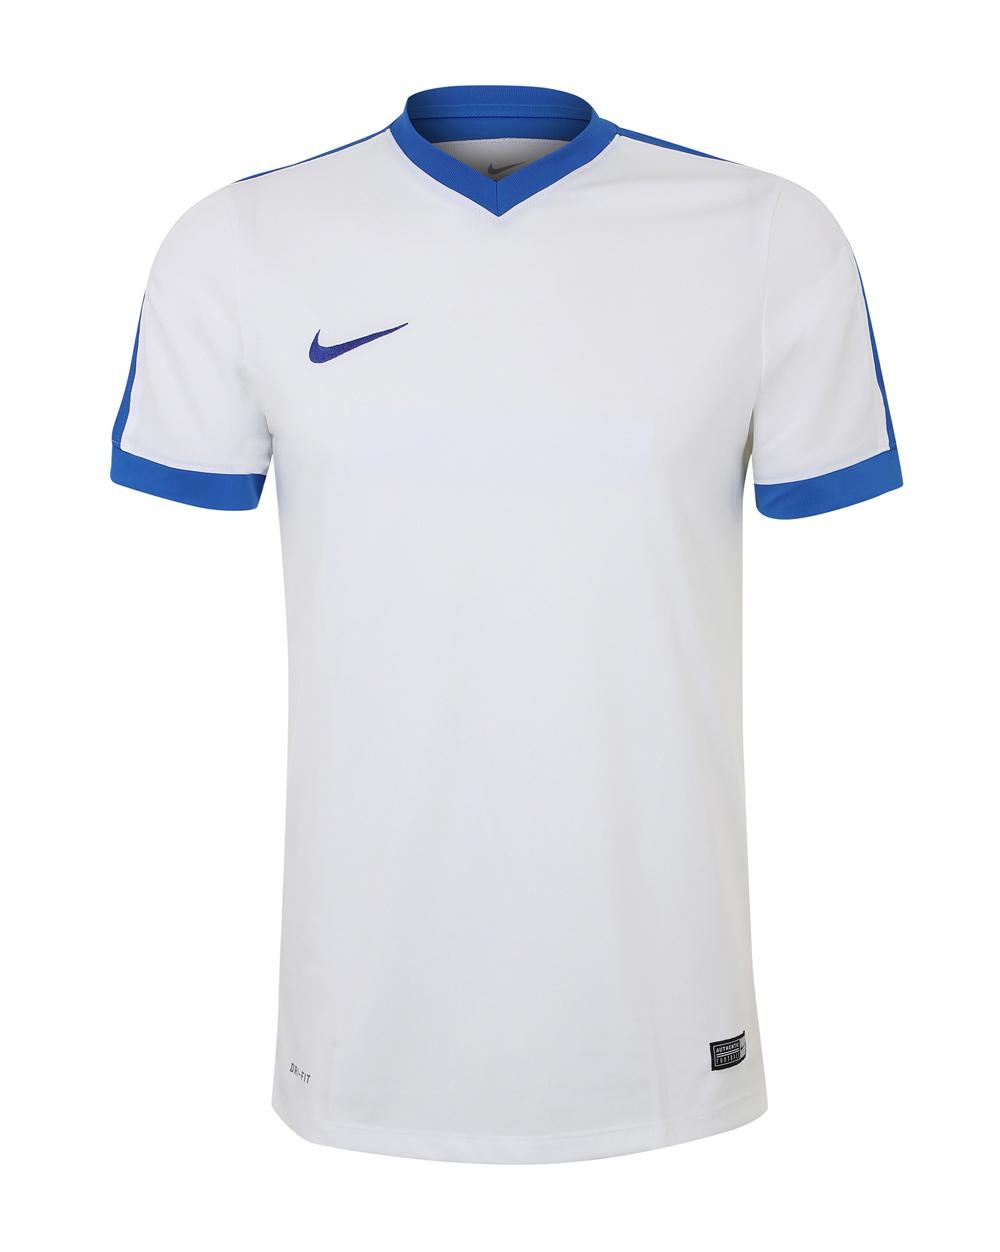 0fac4a8773d4e The Futbol Store - Camisetas de fútbol Nike y Adidas desde  339